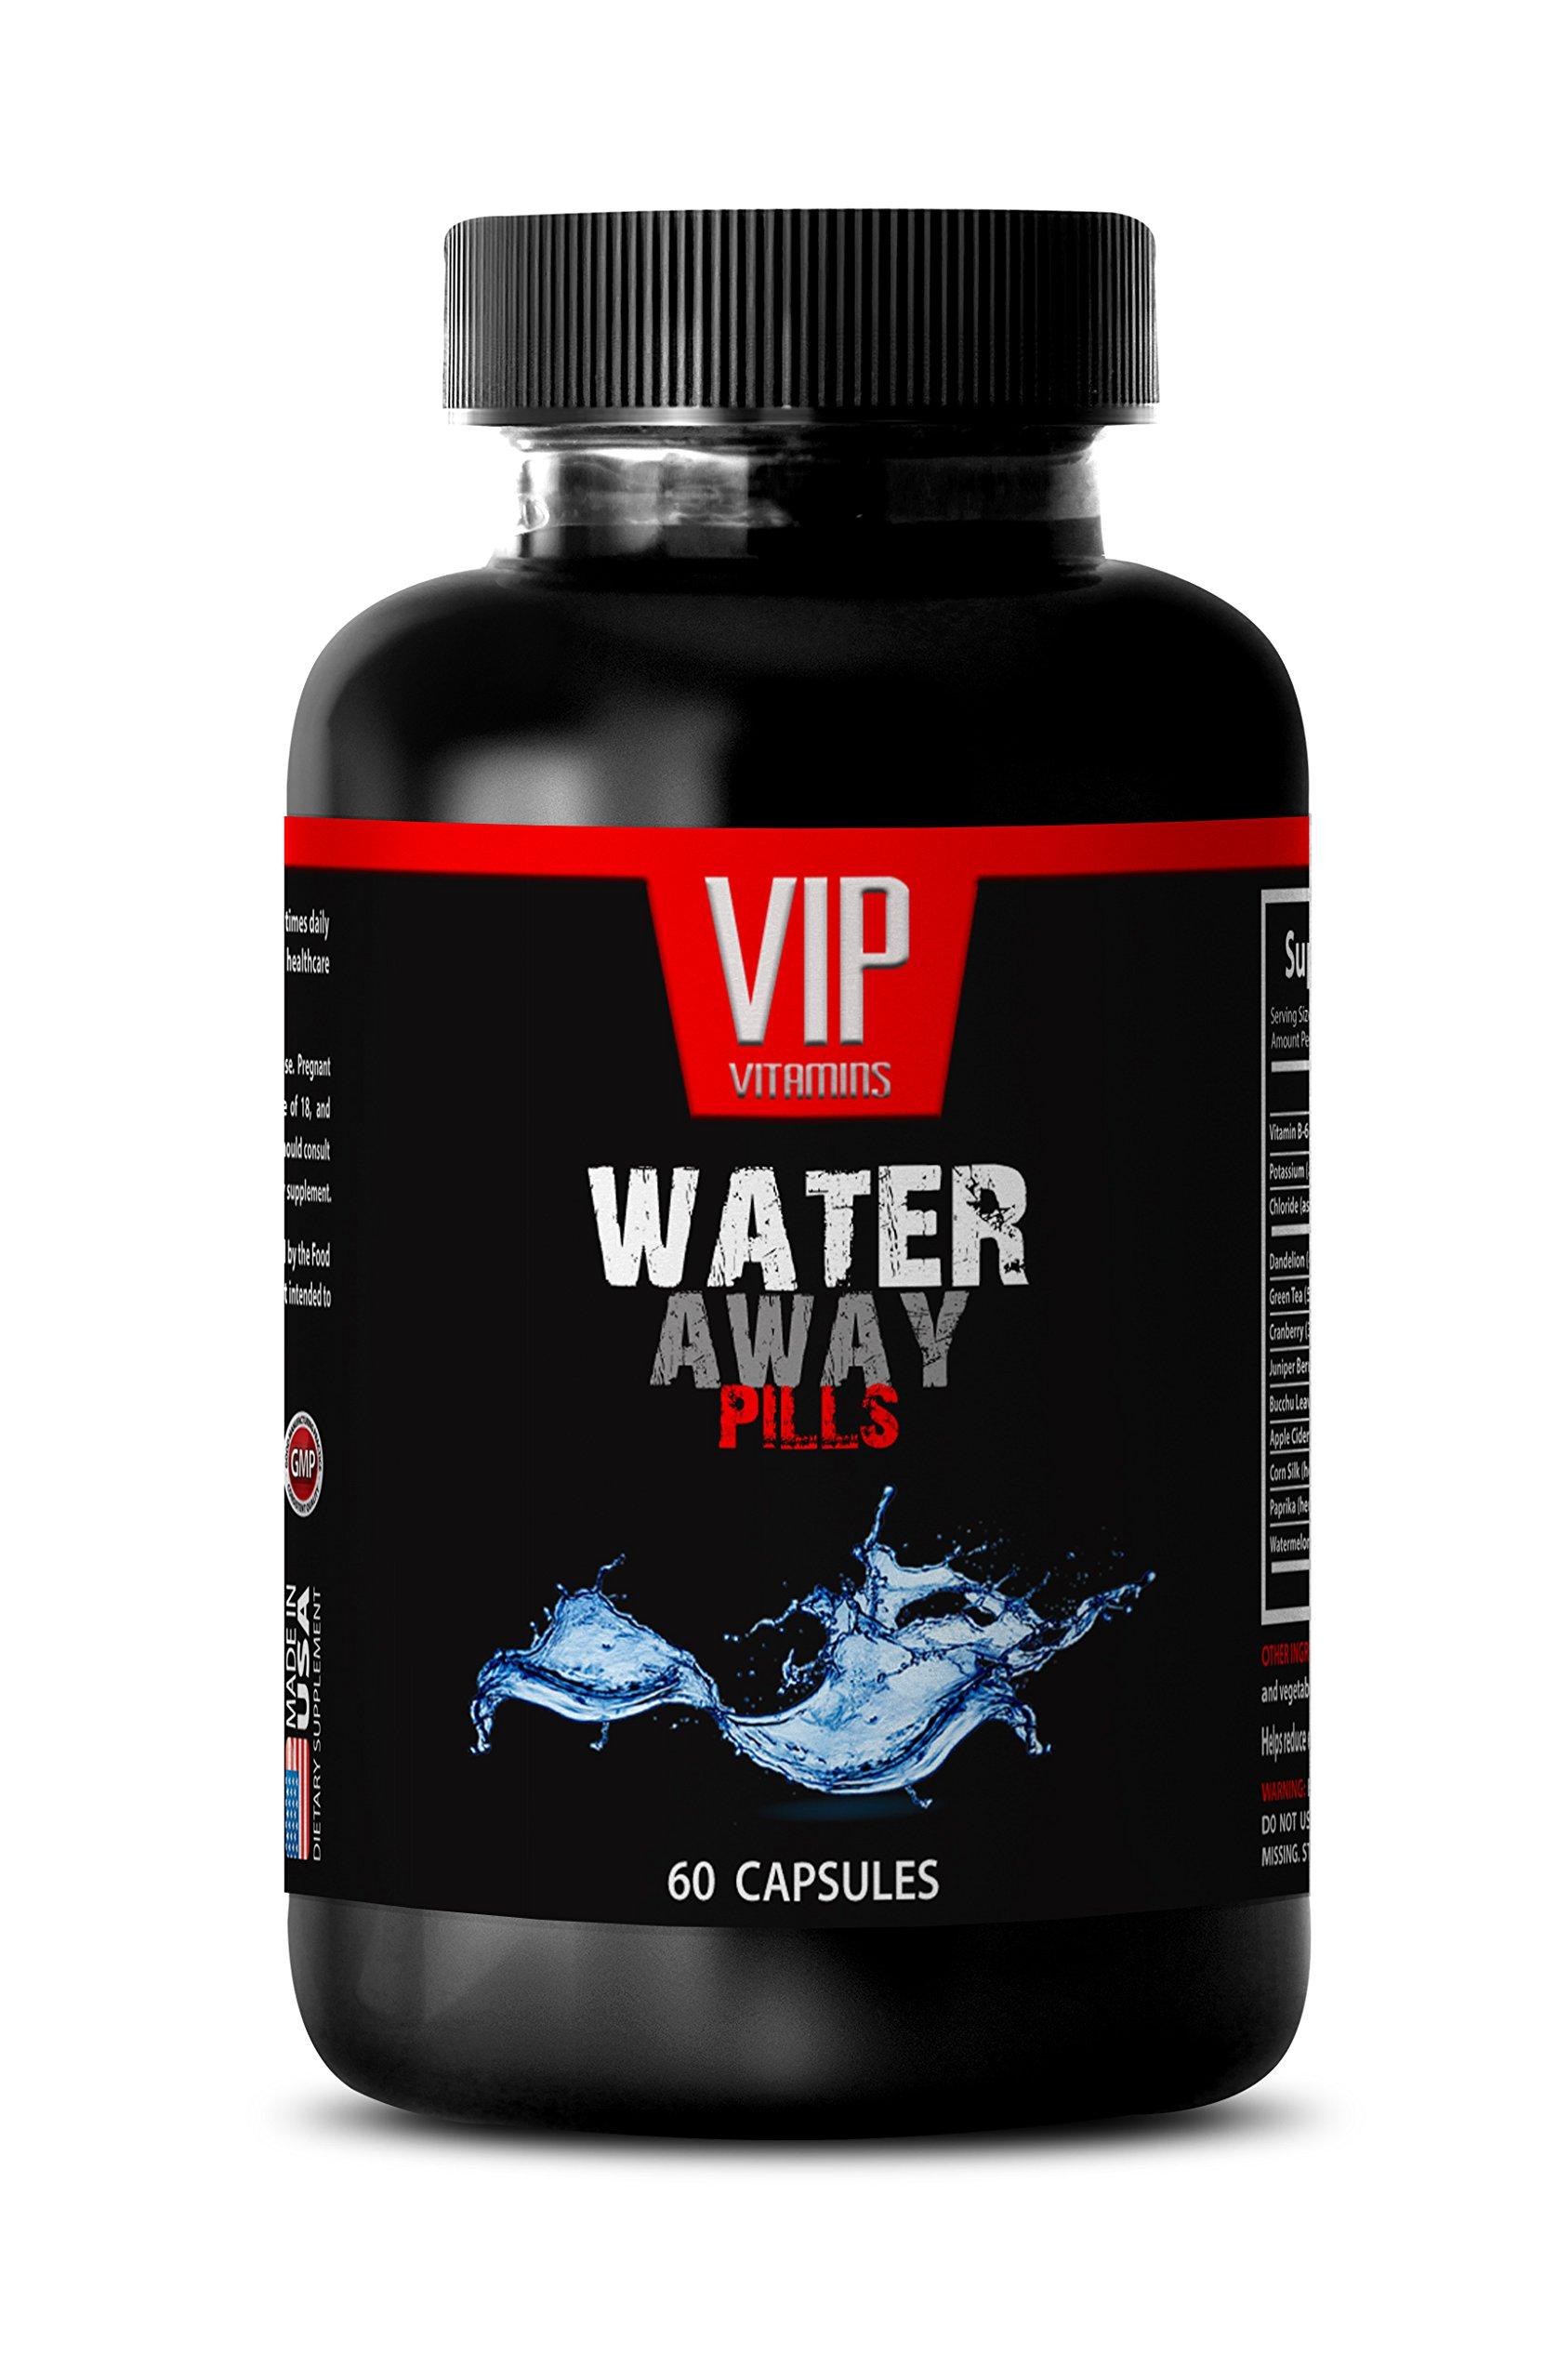 Urinary tract health - WATER AWAY DIURETIC PILLS - Watermelon, Dandelion, Paprika, Potassium - 1 Bottle 60 Capsules by VIP VITAMINS